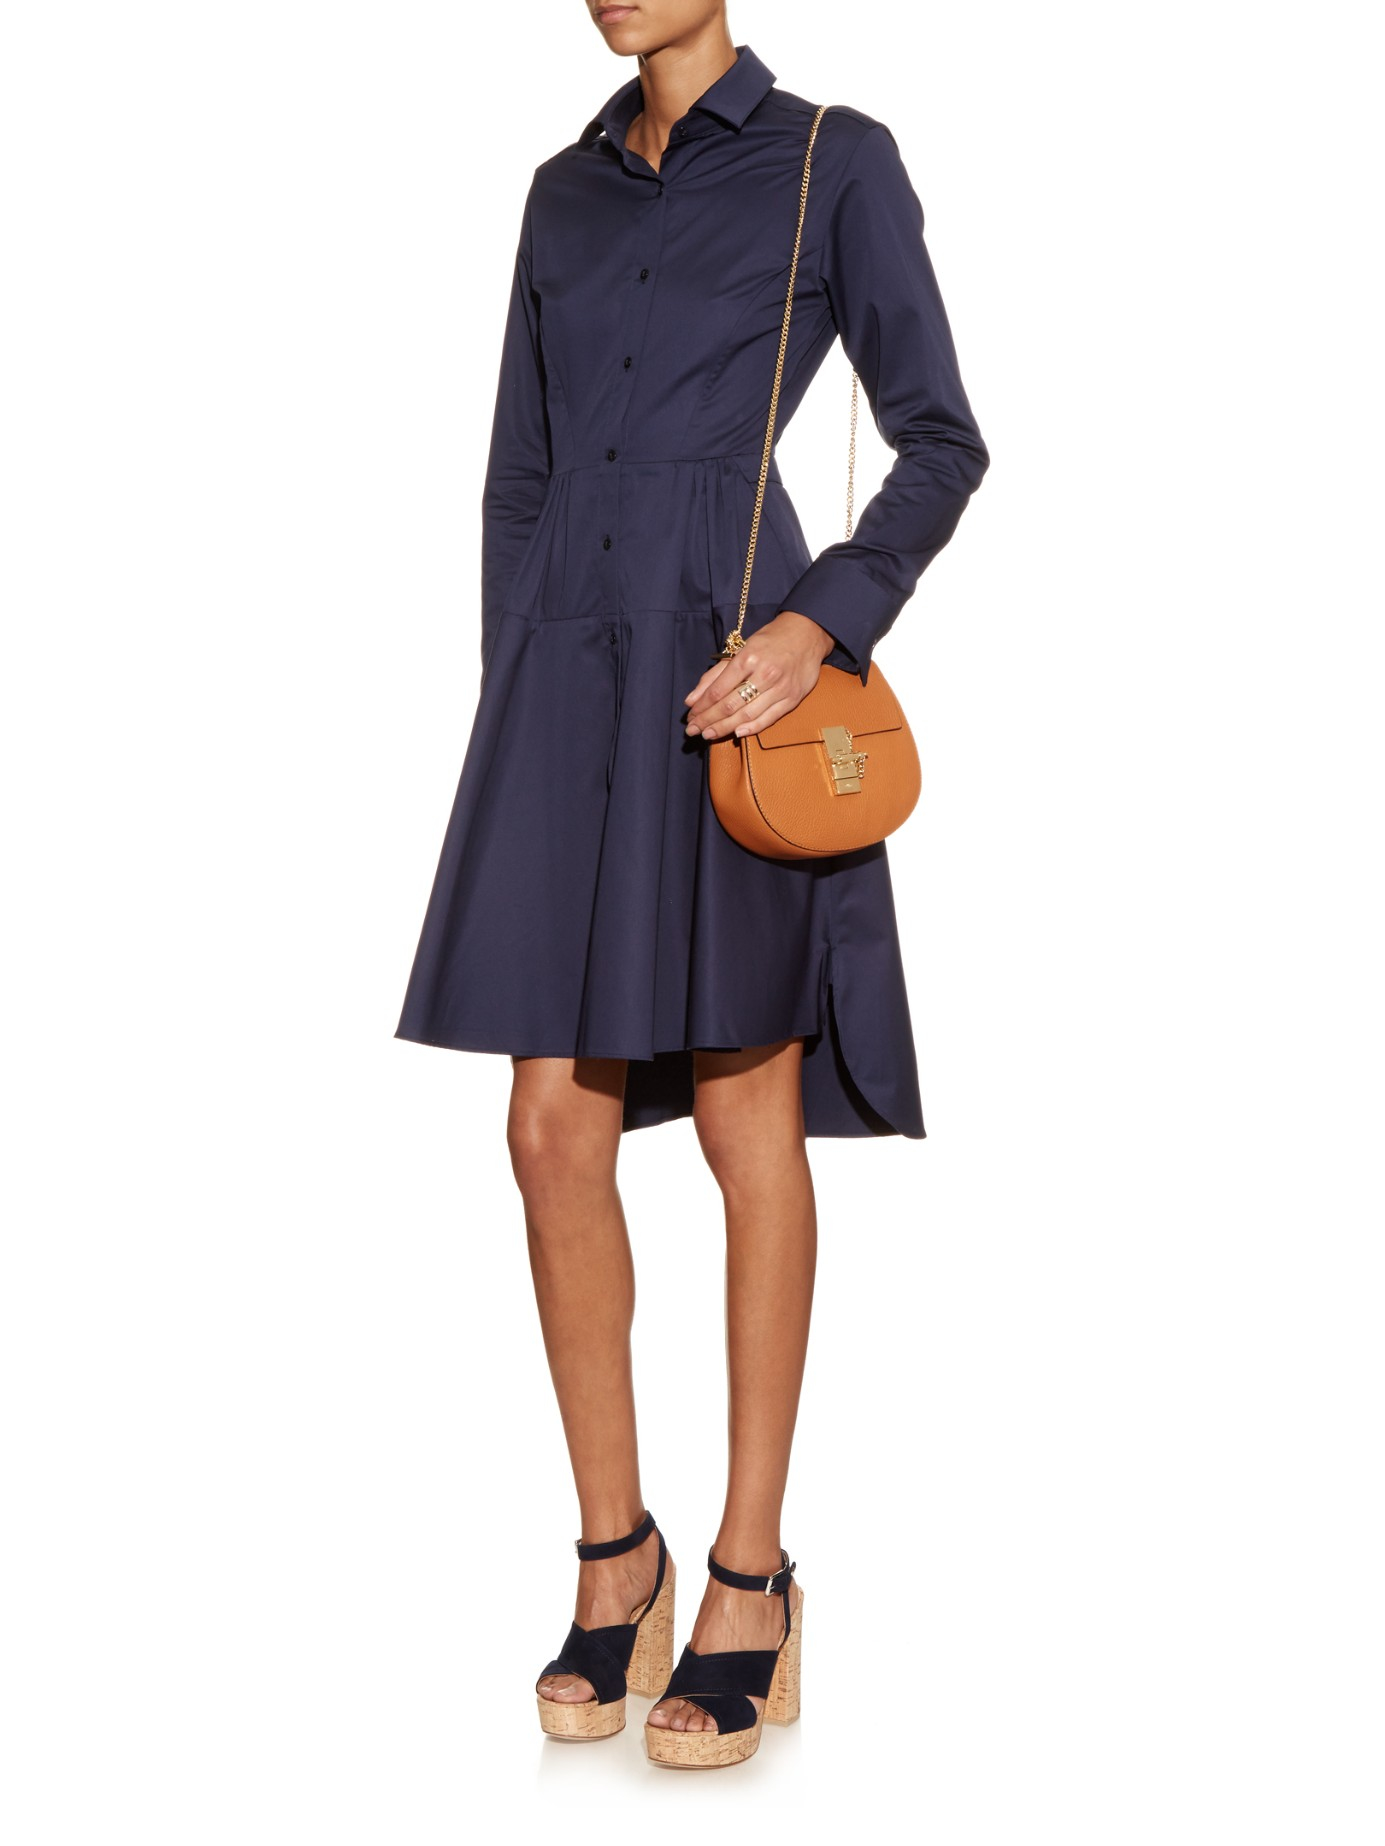 7a25227385c0c Chloé Drew Mini Leather Cross-Body Bag in Brown - Lyst